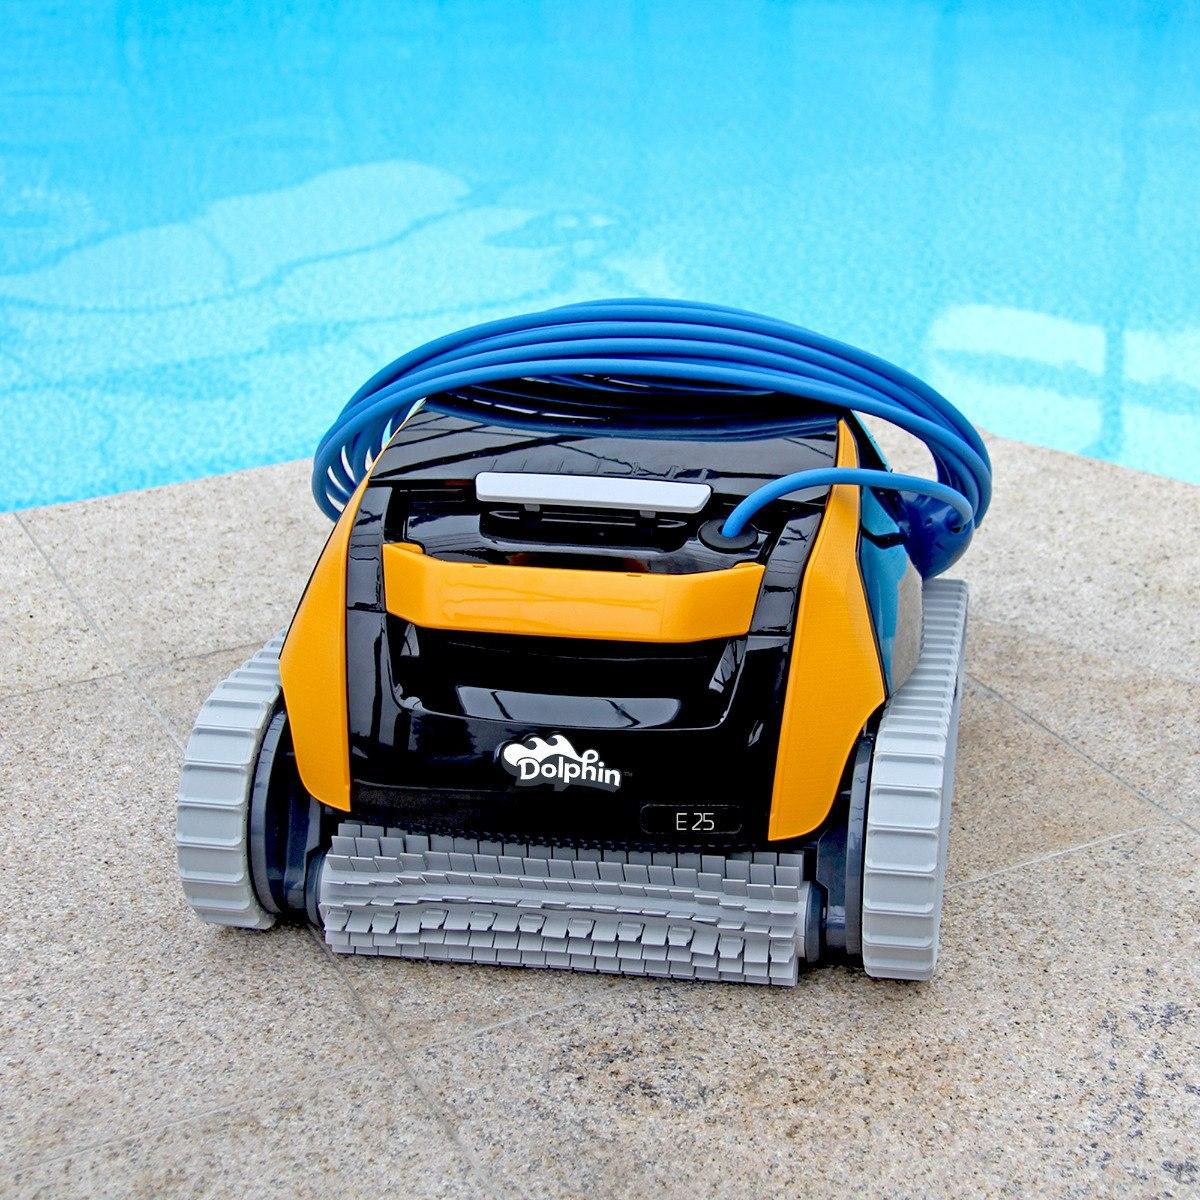 Limpiafondos Dolphin pool robot jujuju aquacenter benissa javea denia moraira calpe altea benidorm albir